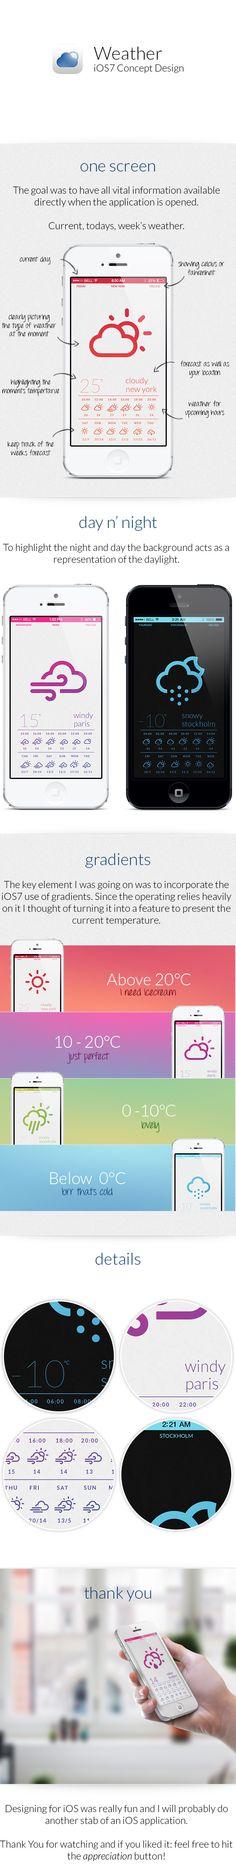 Weather Concept Design by Markus Waltré, via Behance Ios 7 Design, Mobile Ui Design, Flat Design, Weather Application, User Experience Design, Ui Design Inspiration, User Interface Design, Apps, Service Design